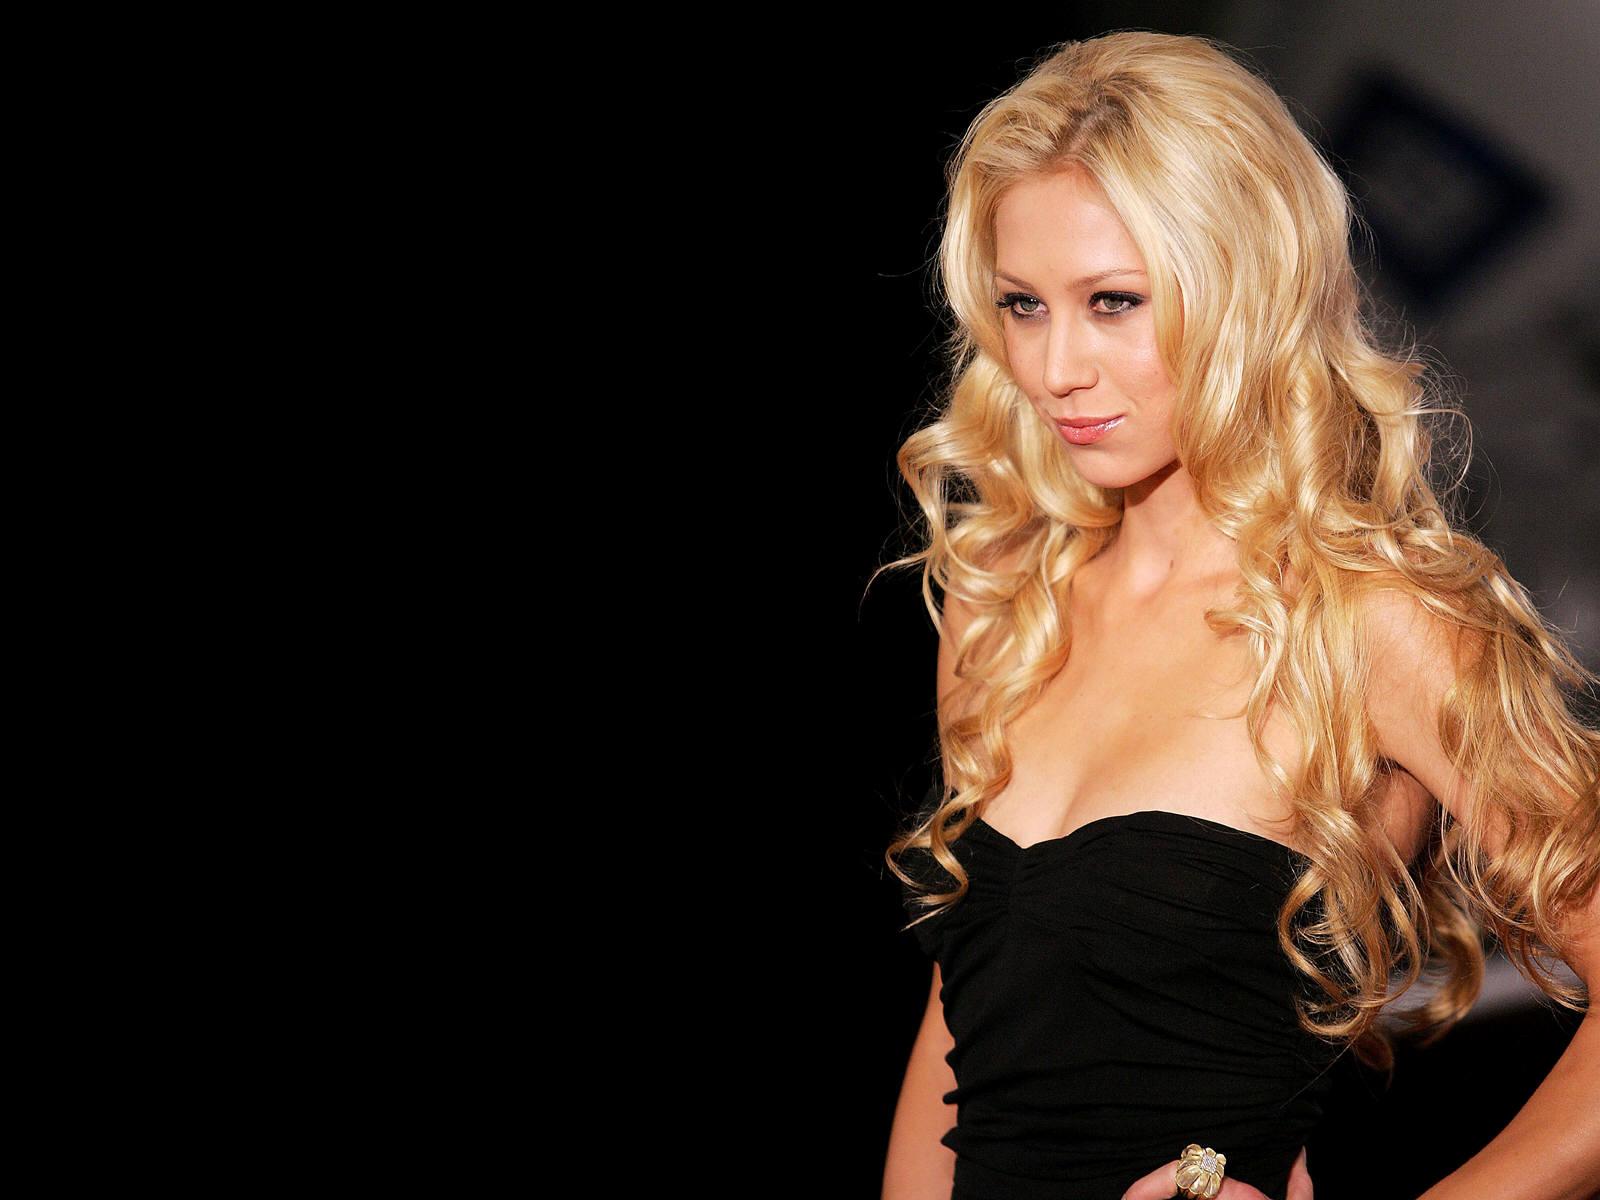 Anna Kournikova Black Dress Wallpaper 65035 1600x1200px 1600x1200